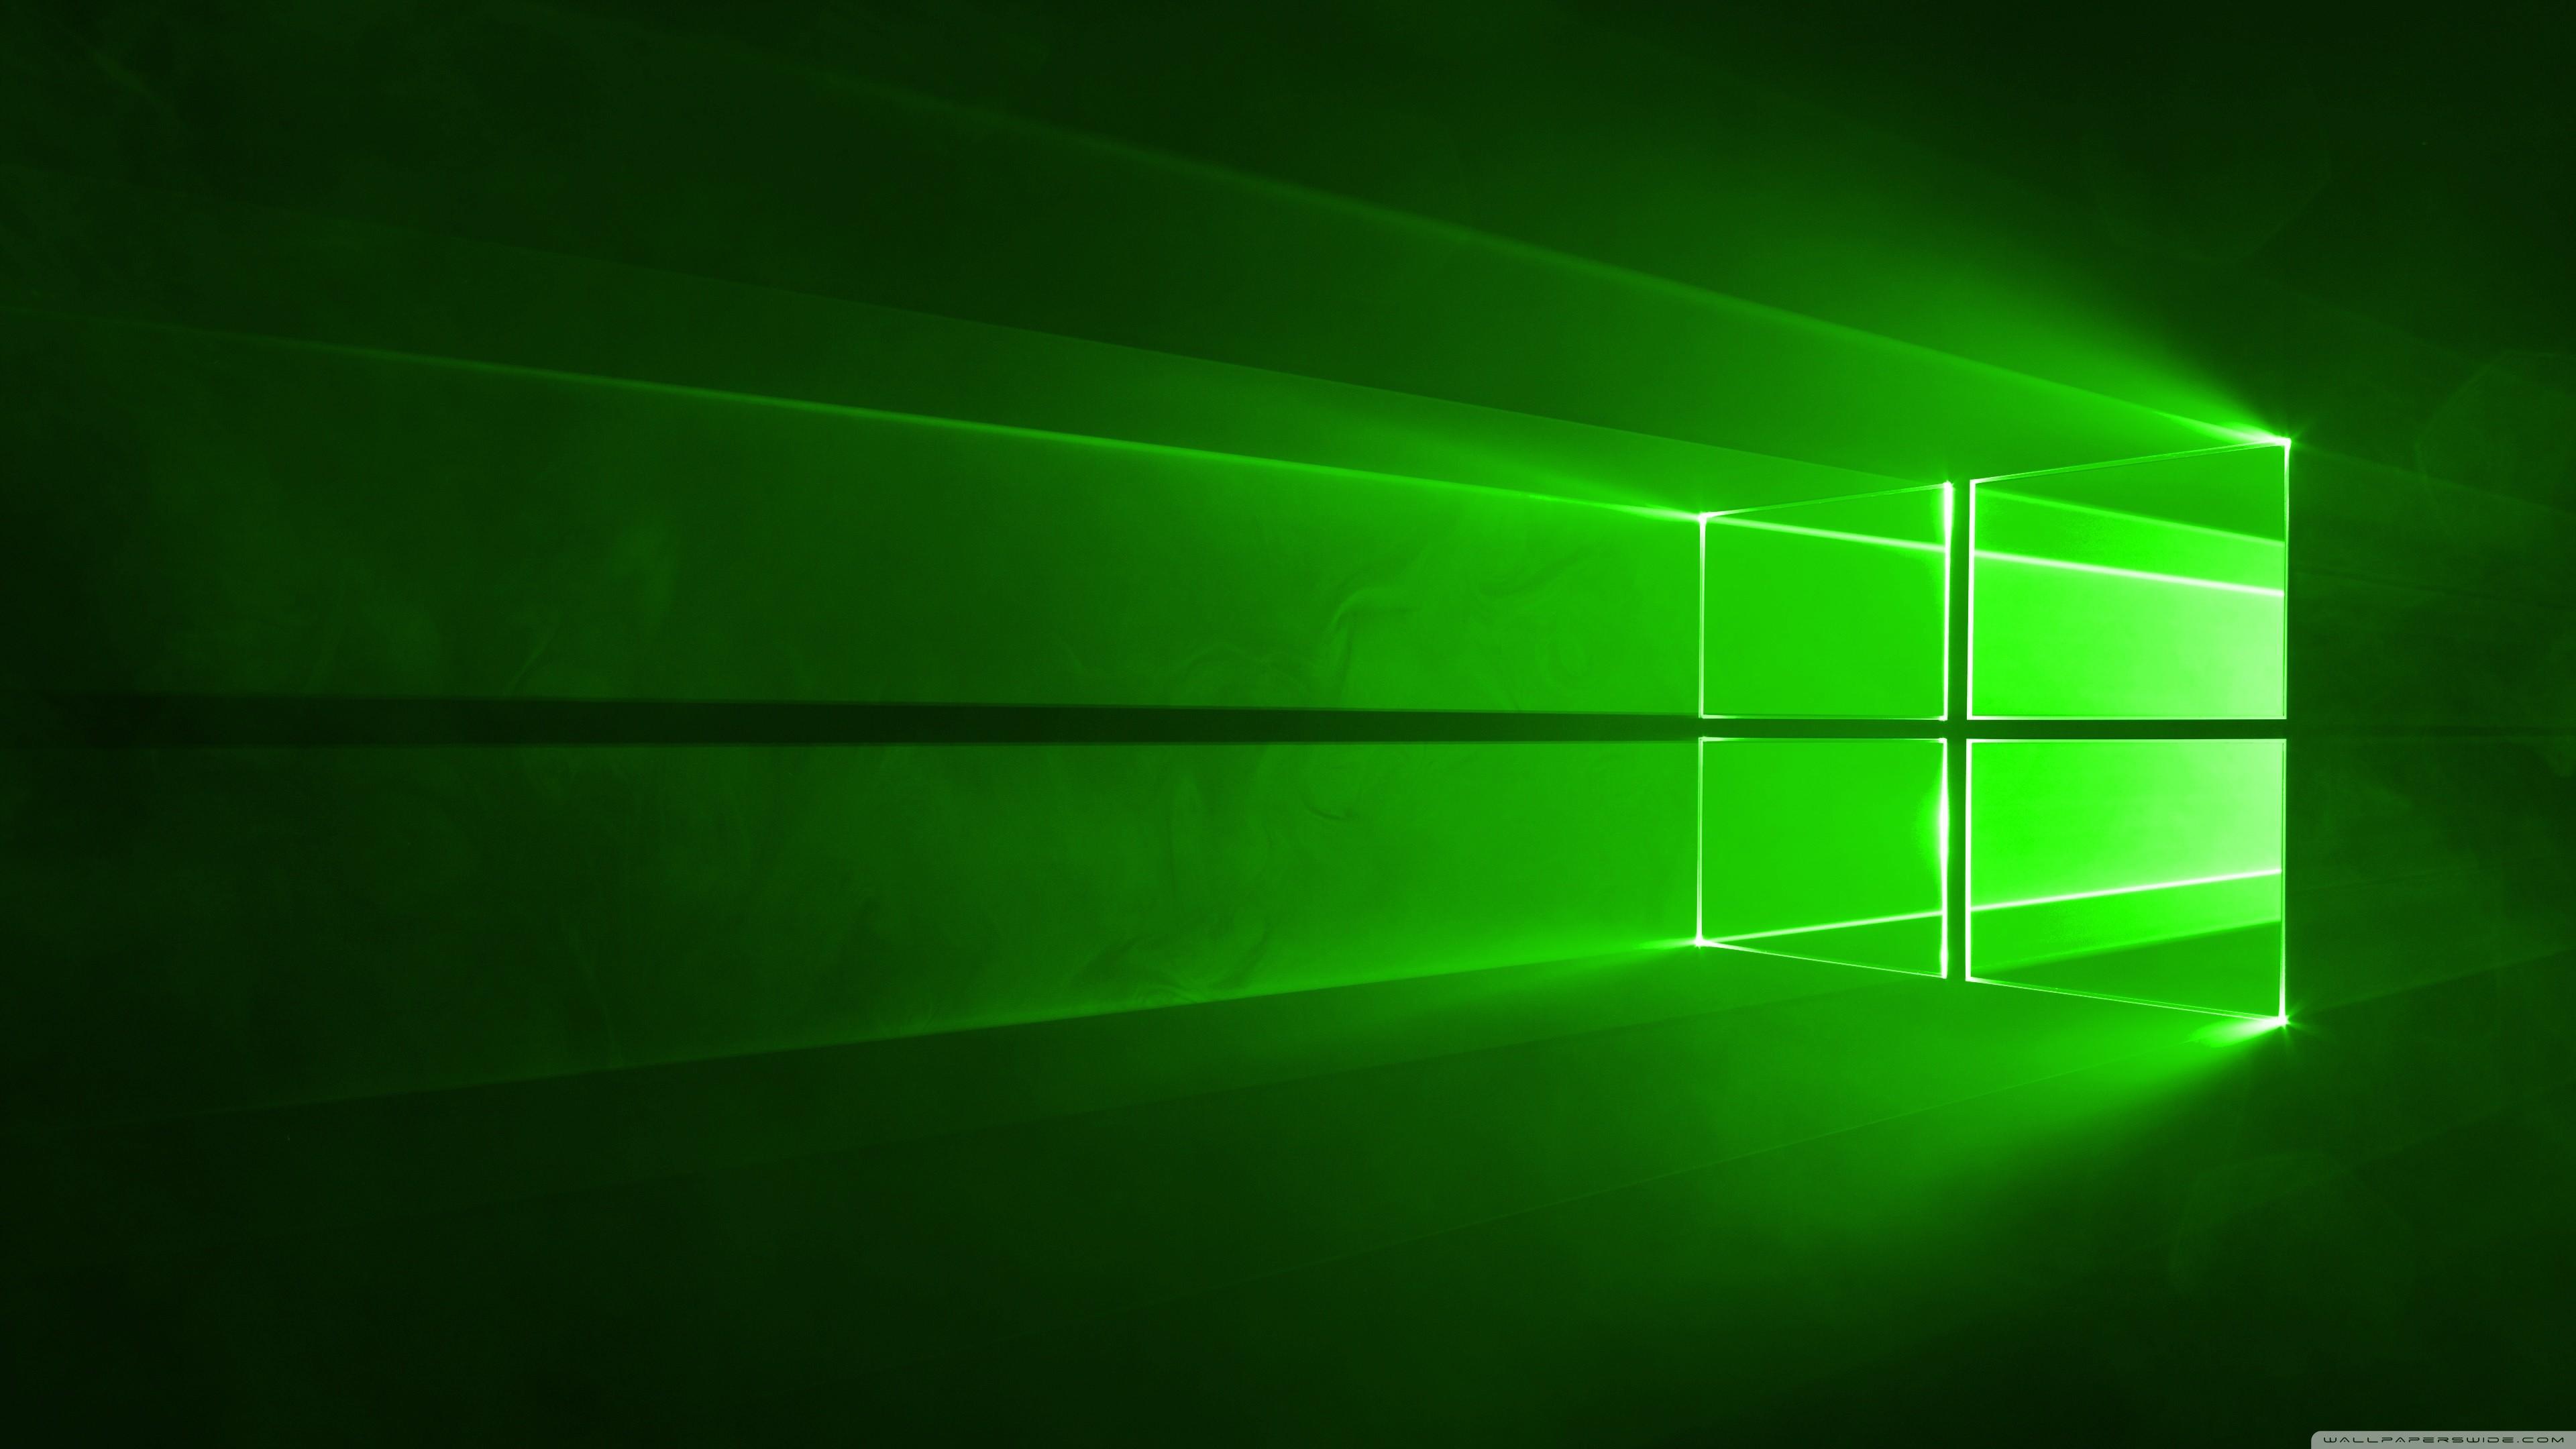 Windows 10 Green HD Wide Wallpaper for Widescreen